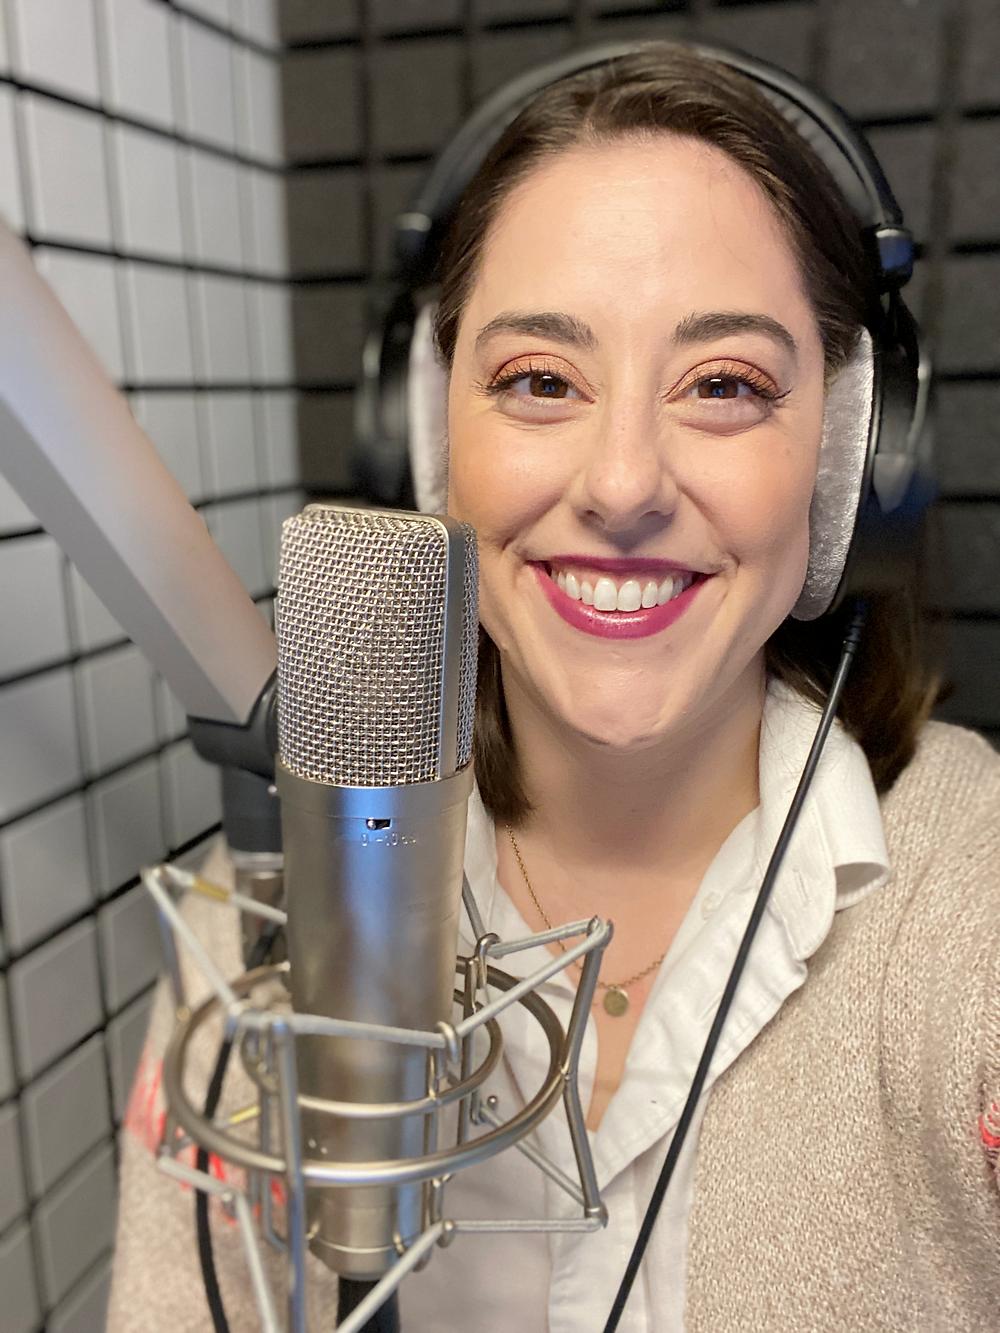 Stephanie Matard, English speaking voice actress in Europe, in her studio